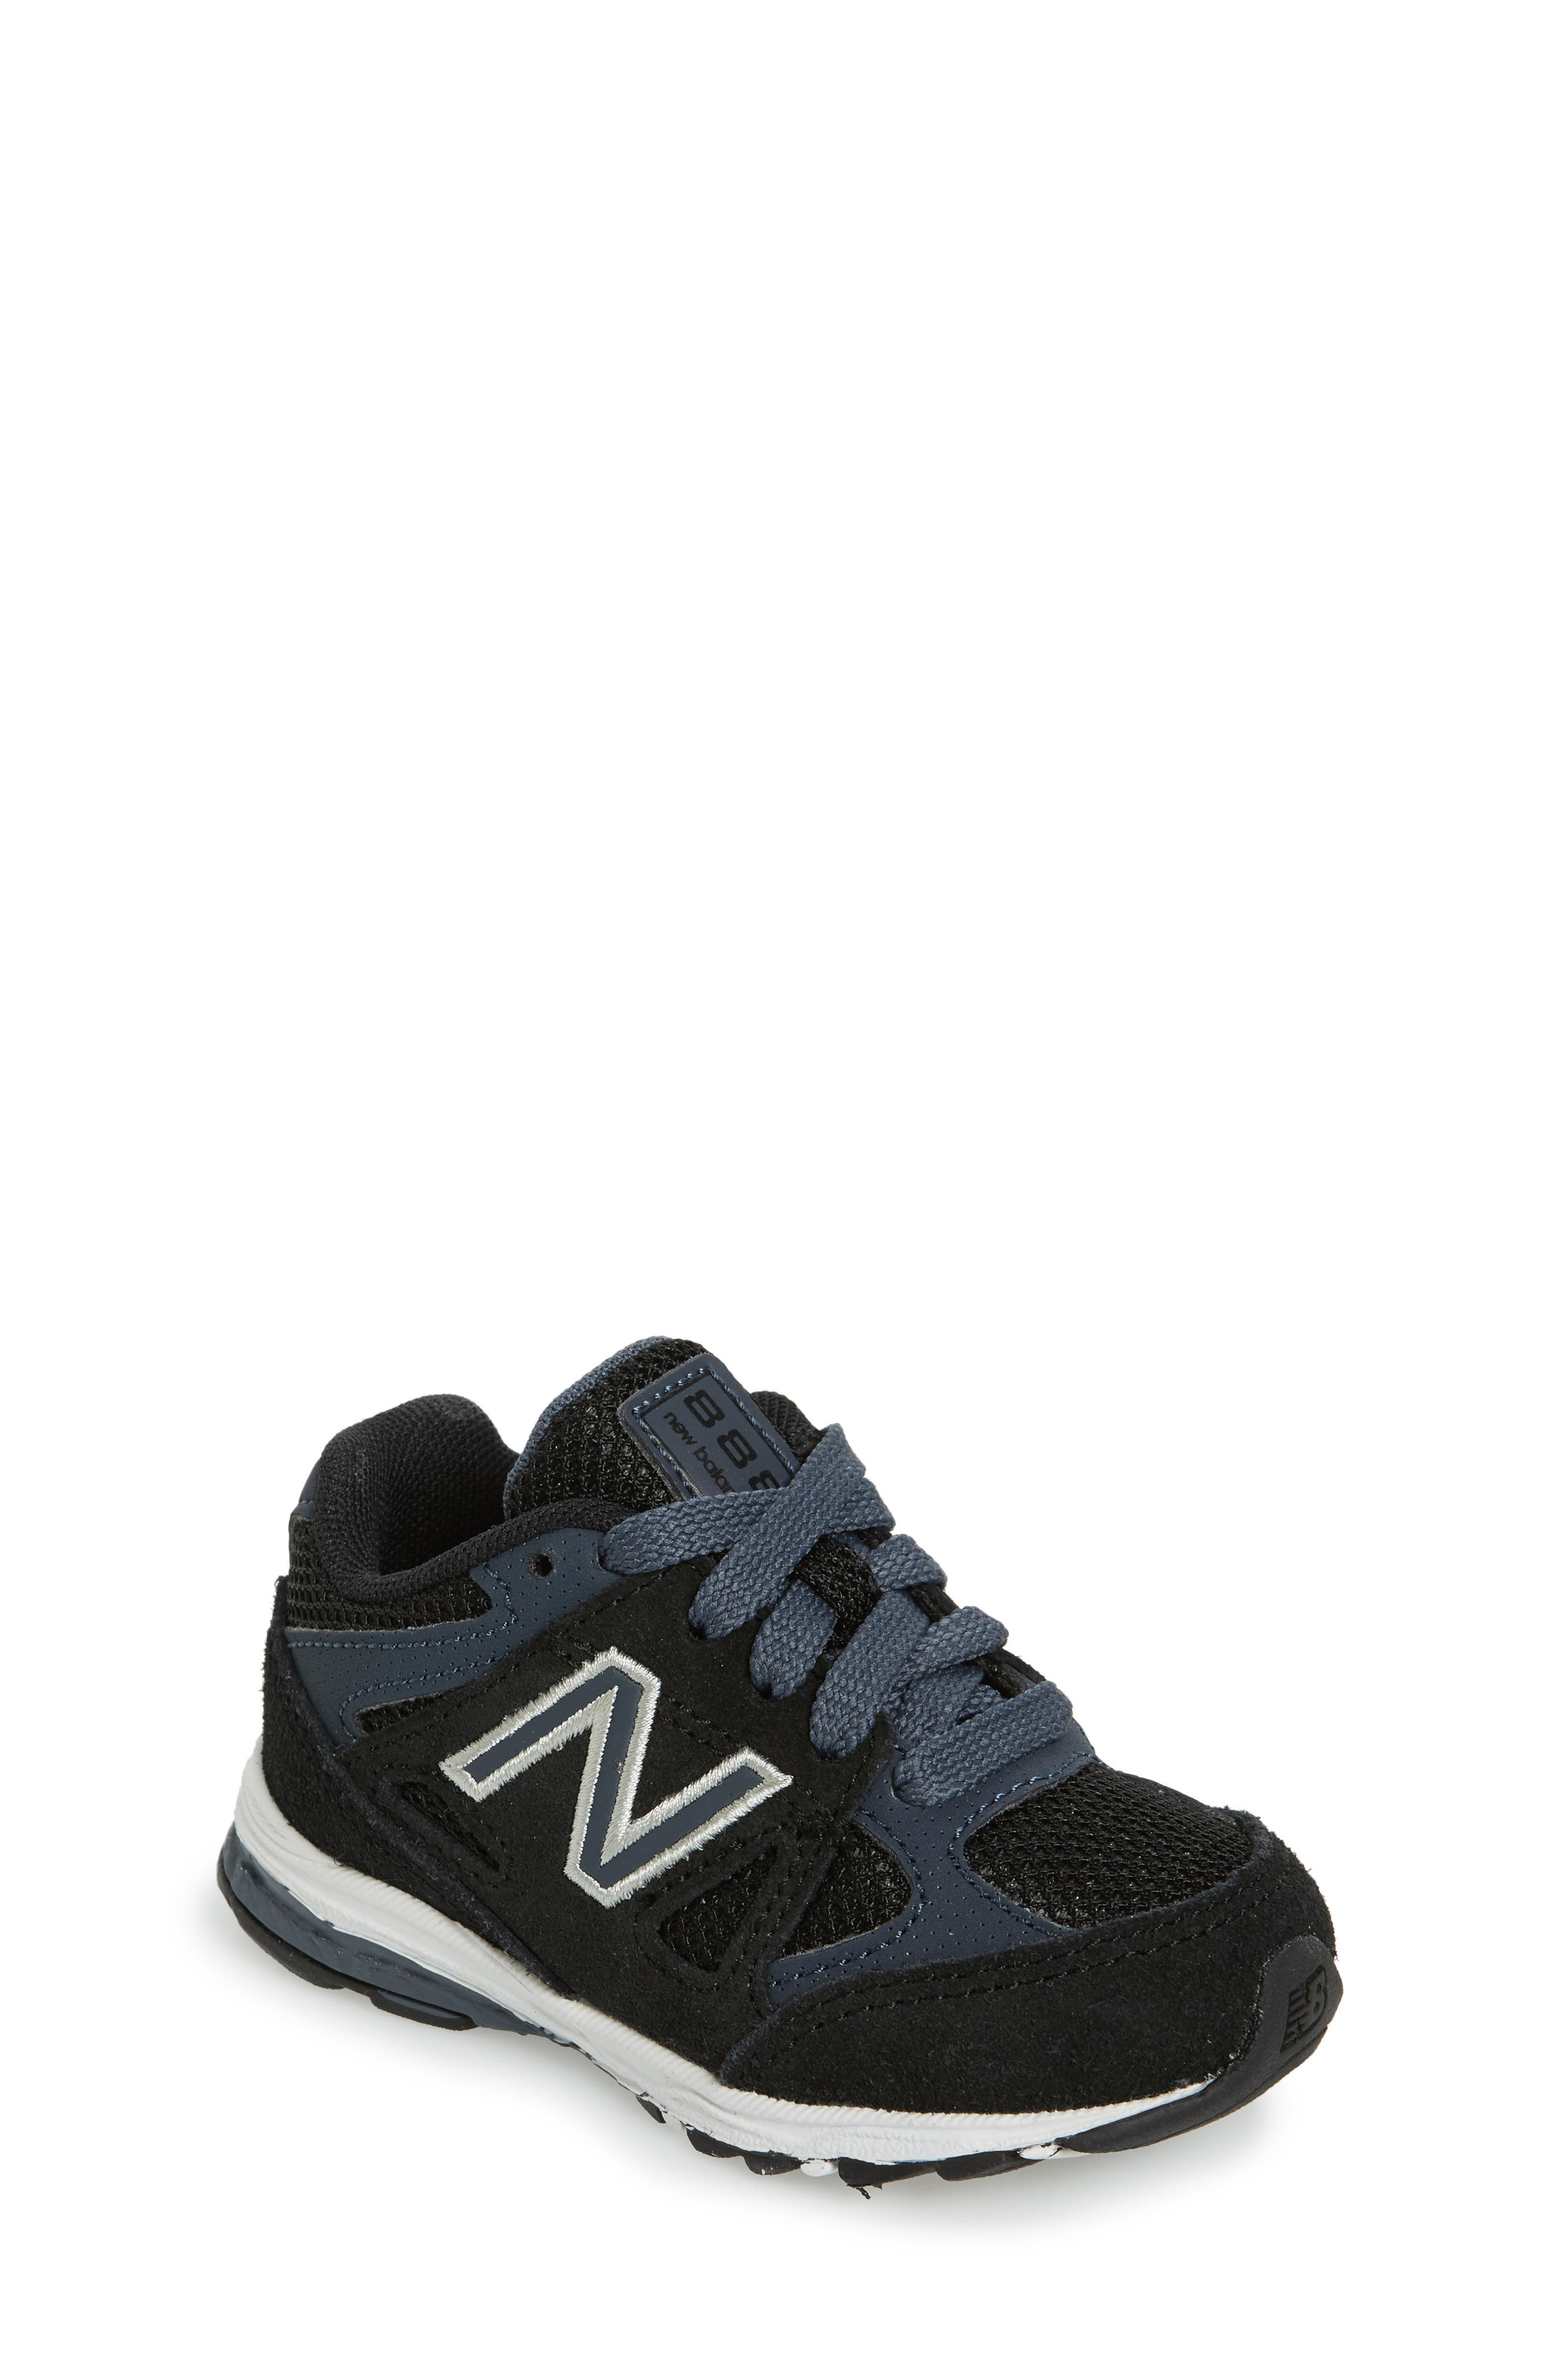 NEW BALANCE 888 Sneaker